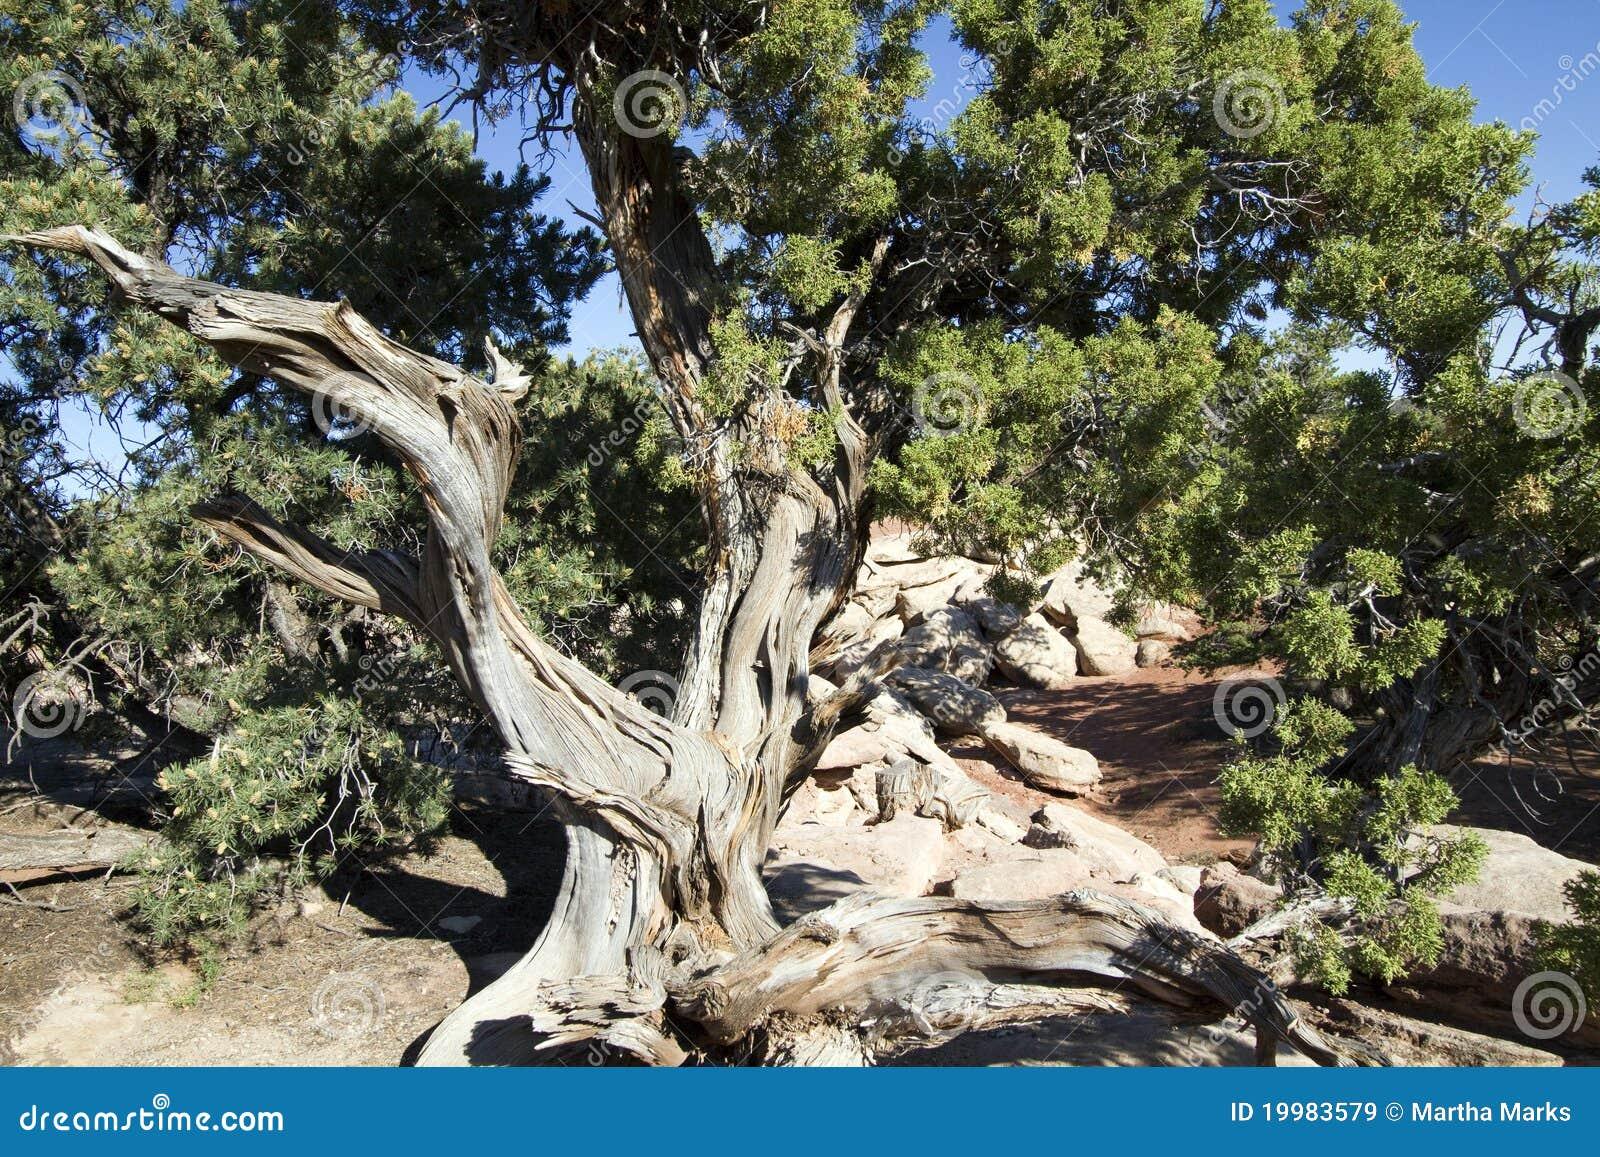 Utah Juniper Tree, Juniperus osteosperma